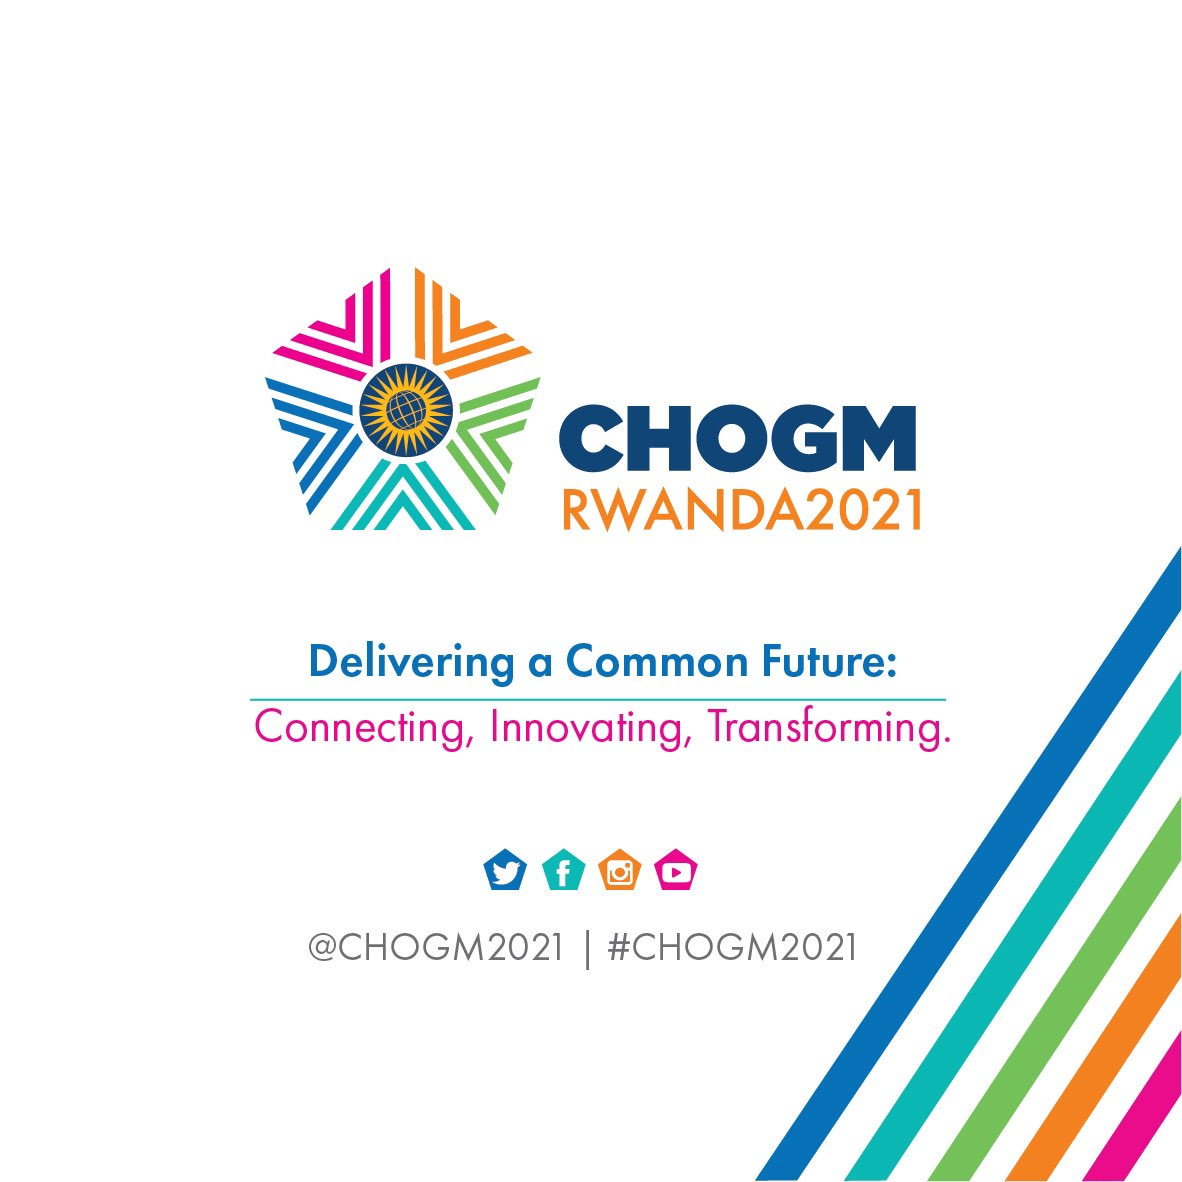 CHOGM Rwanda 2021 (@CHOGM2021) | Twitter